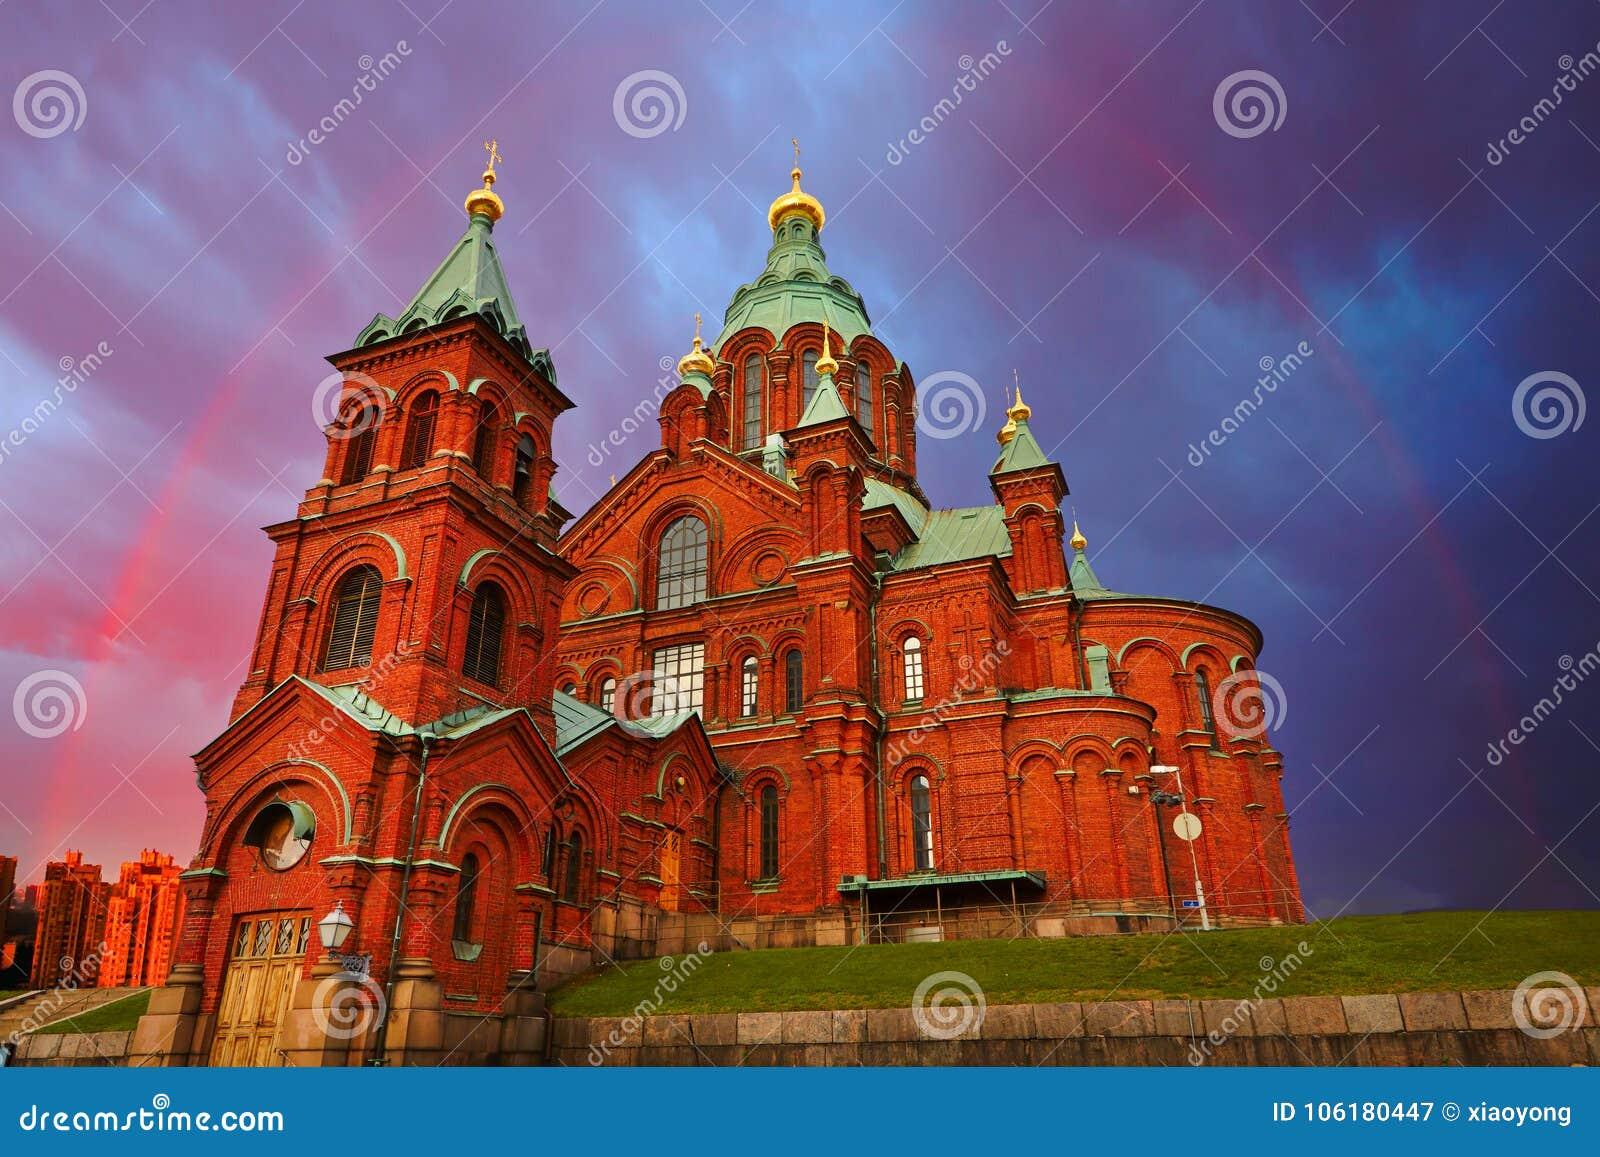 Red Church in rainbow, Helsinki, Finland